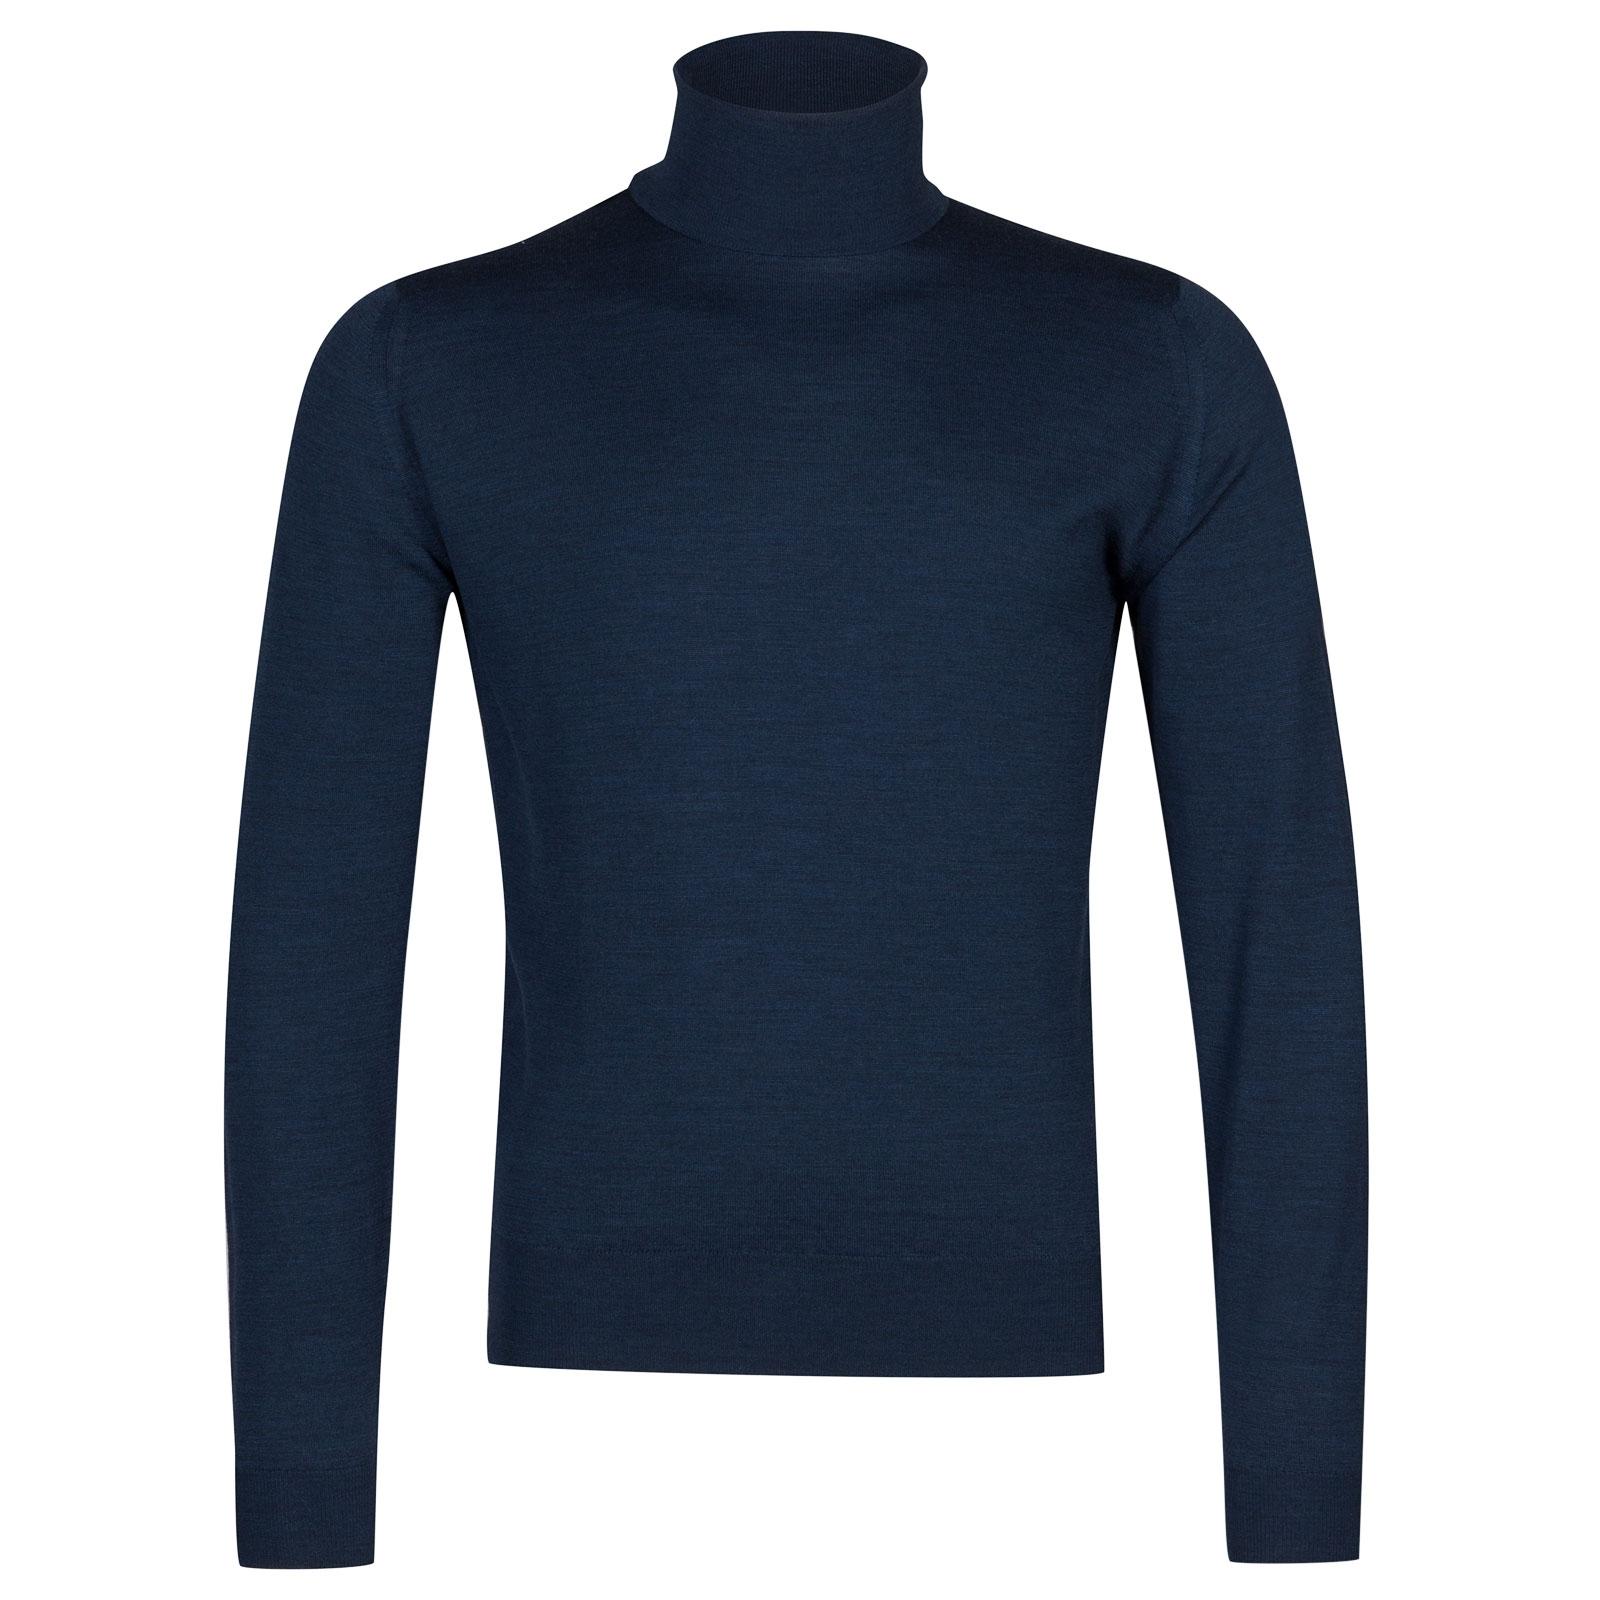 John Smedley Orta Merino Wool Pullover in Indigo-M